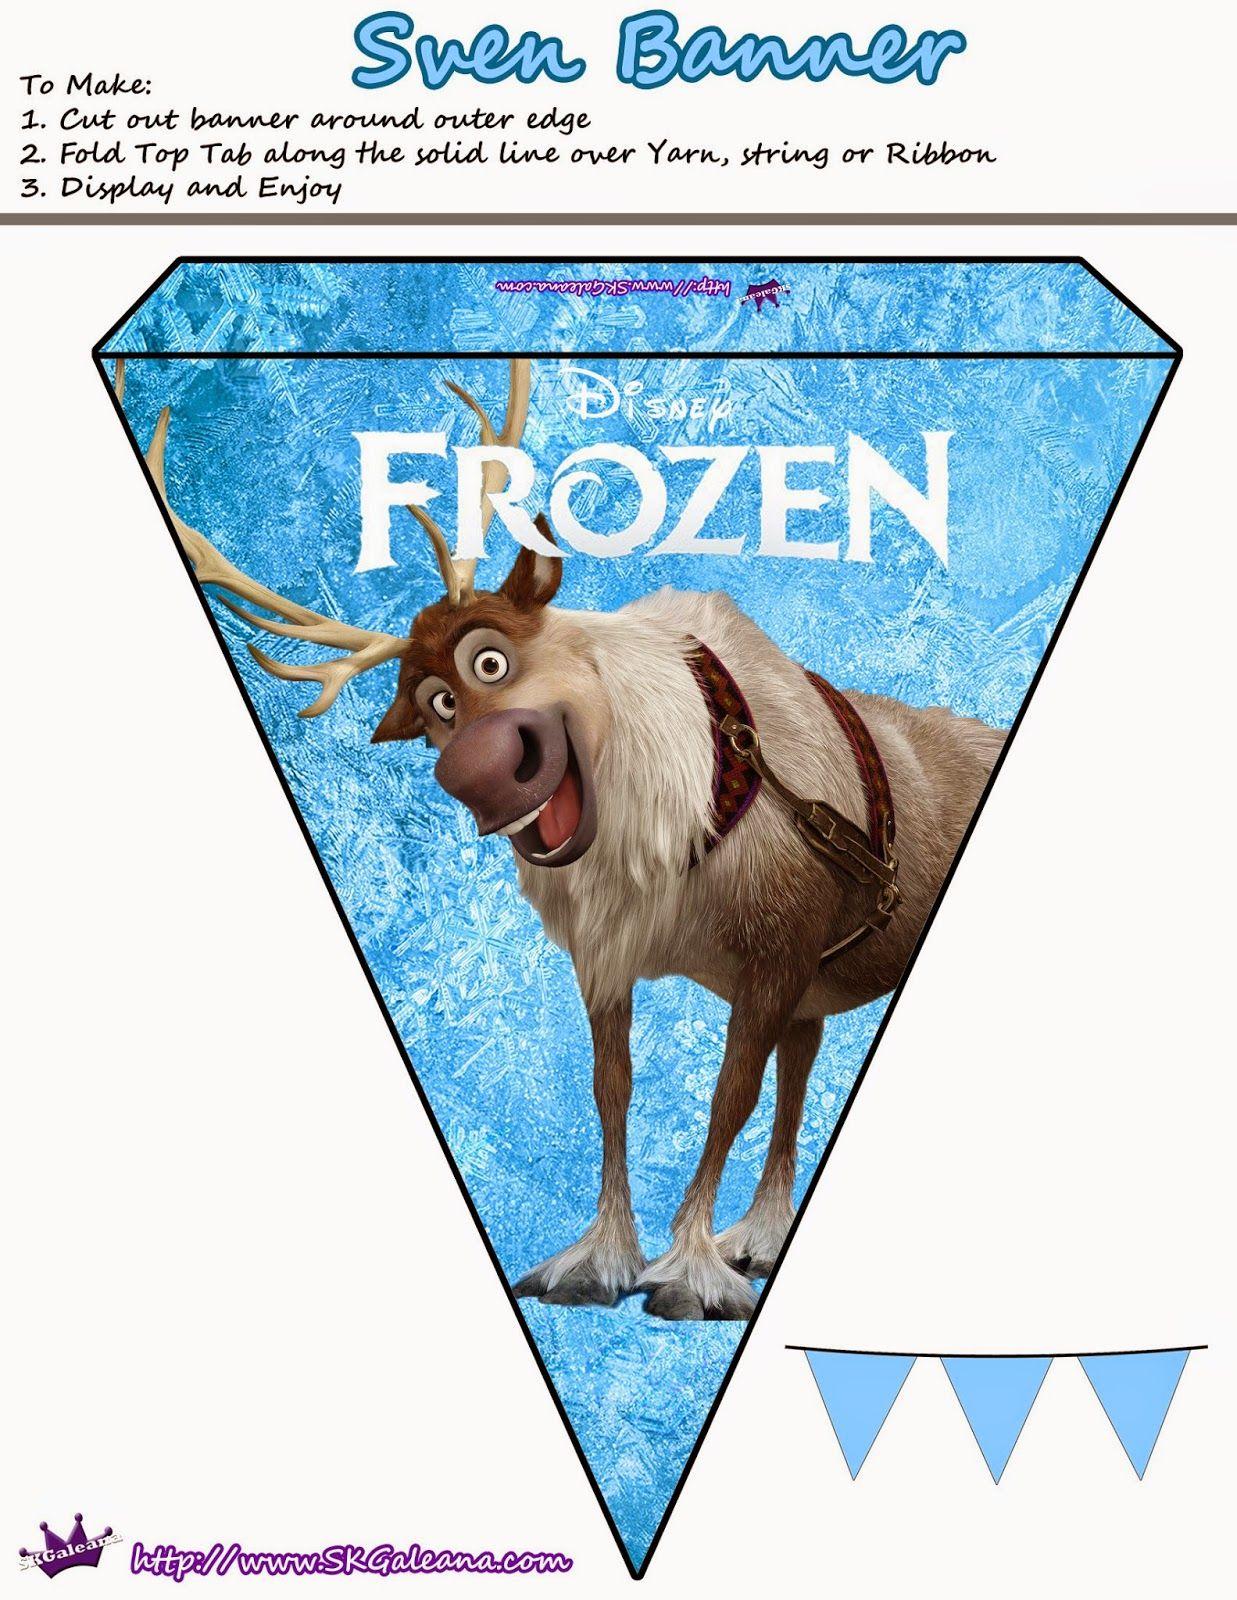 Frozen: Lindos Banderines para Imprimir Gratis. | para imprimir ...